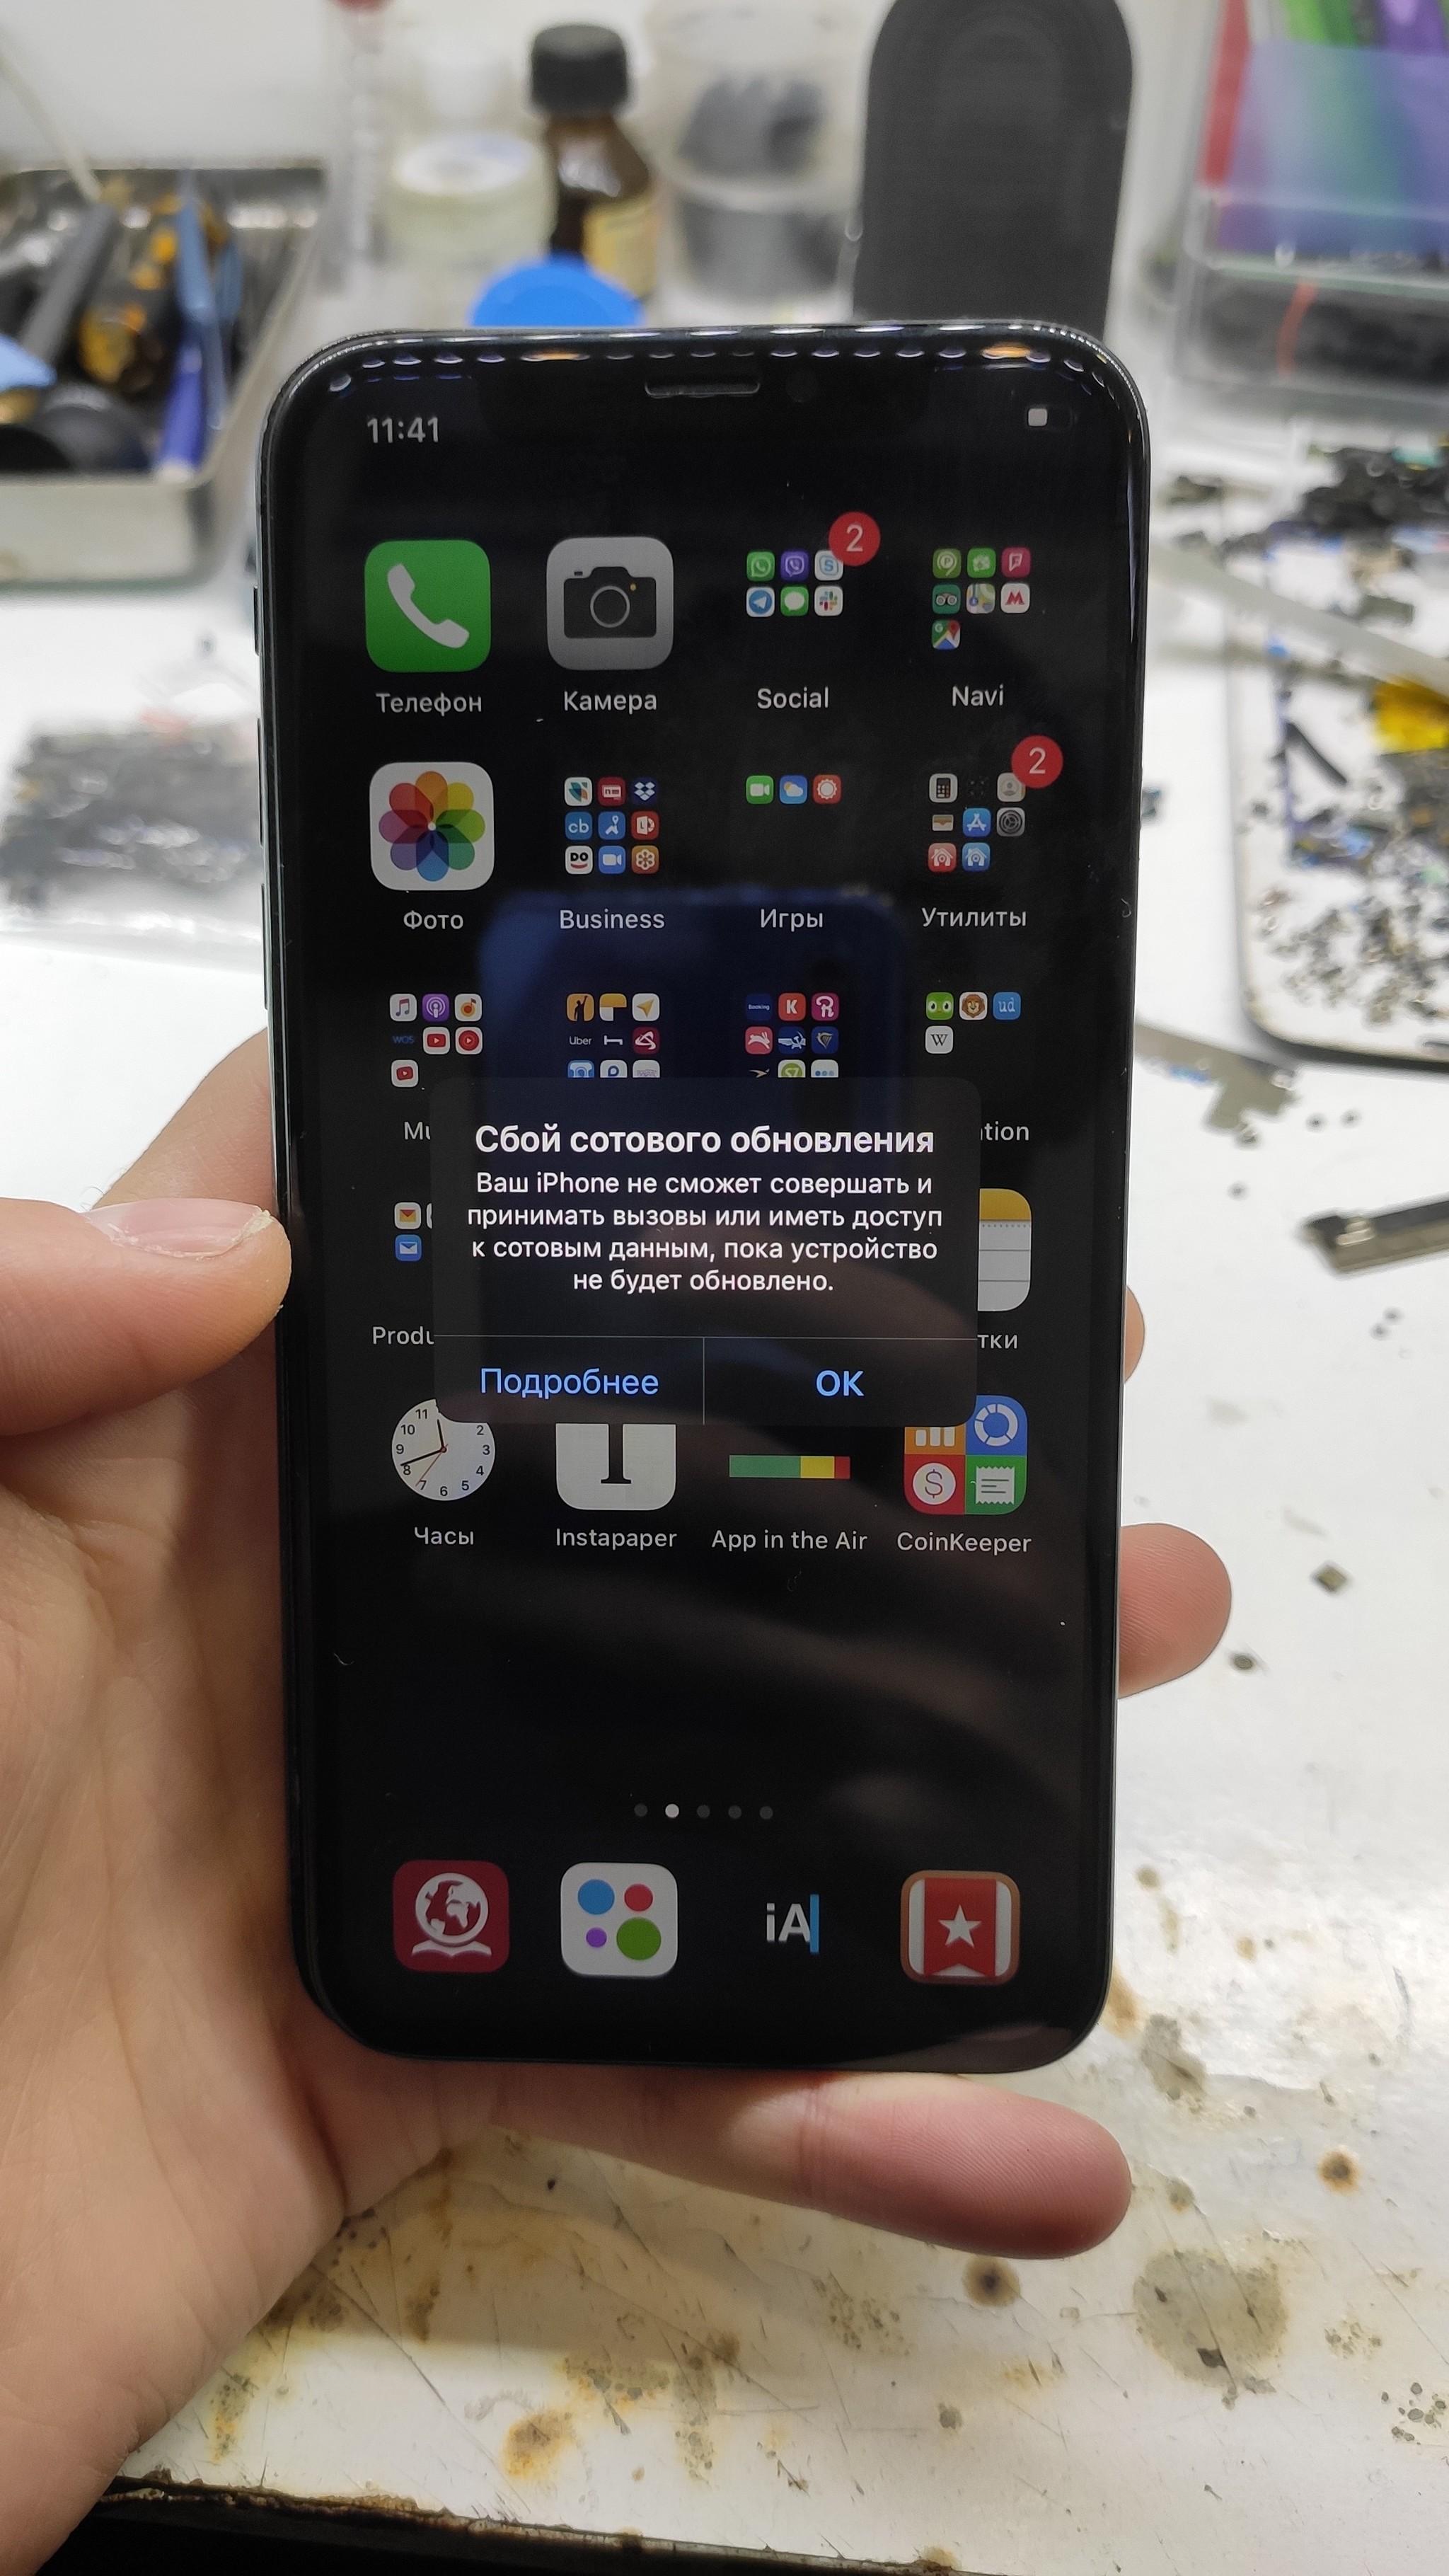 ай саппорт ремонт айфона